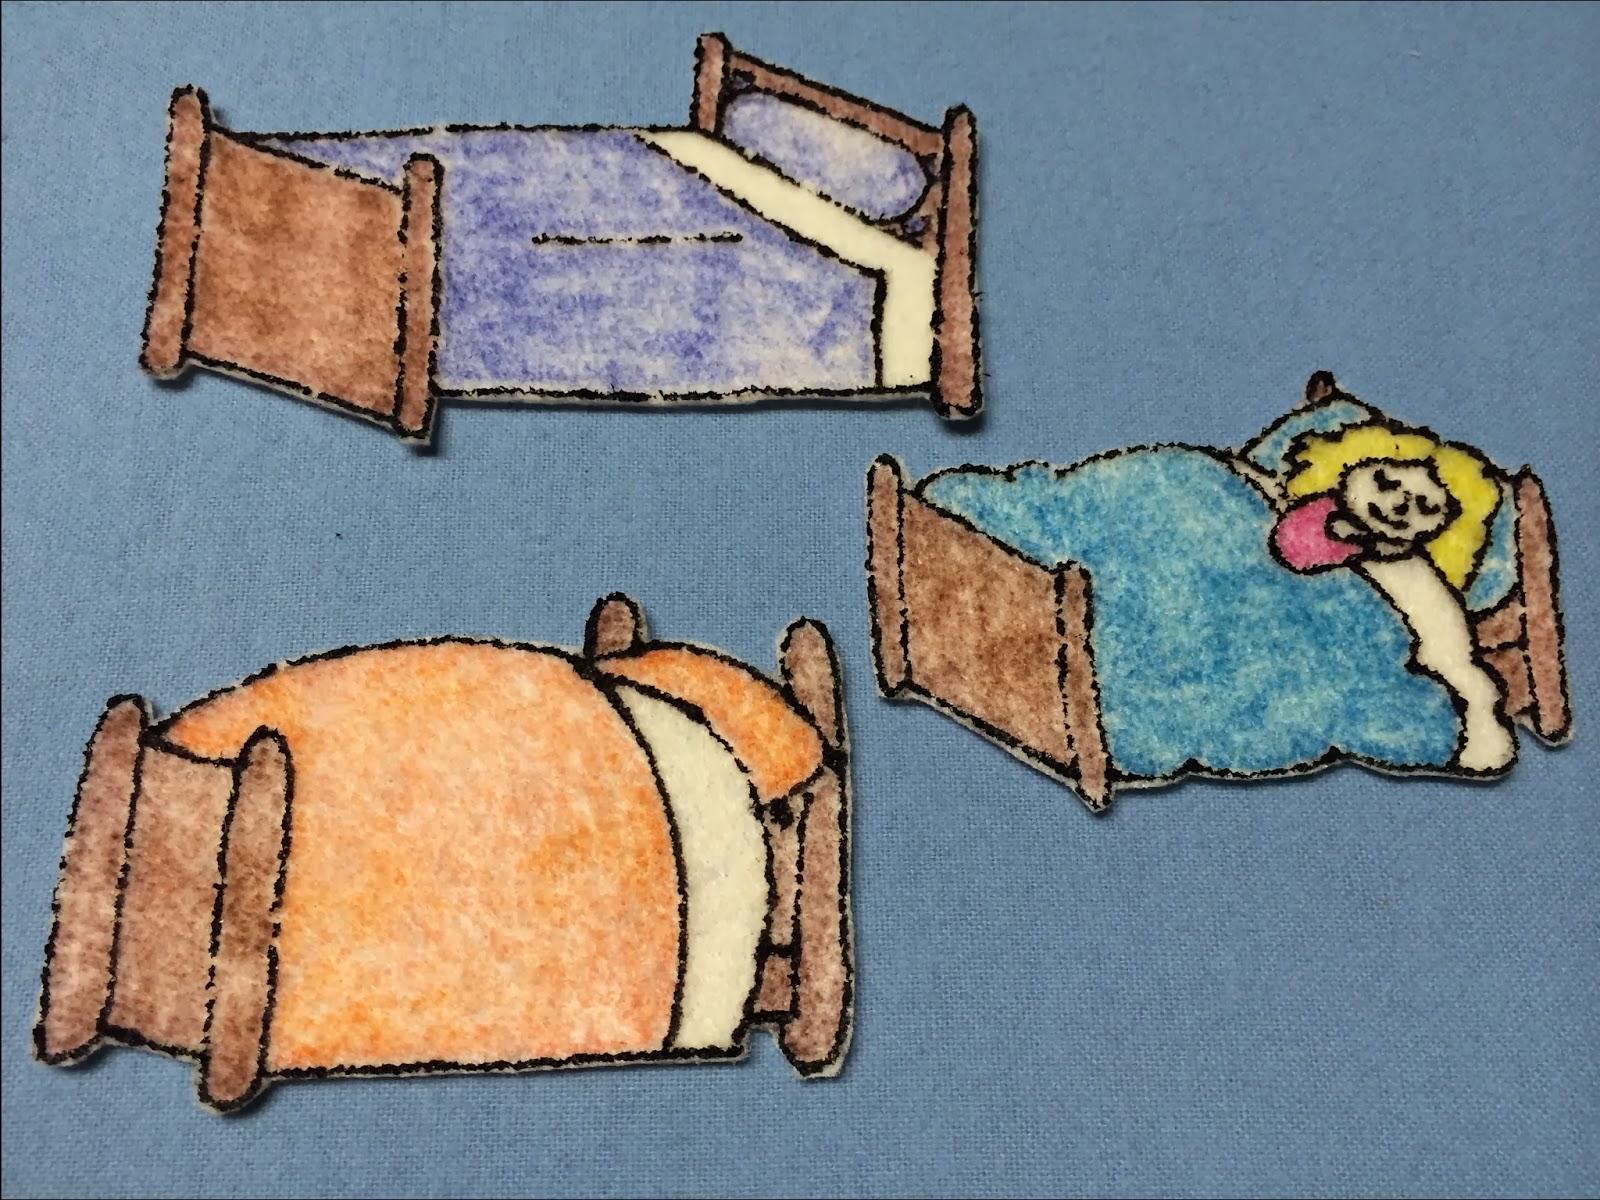 Uncategorized Goldilocks Bed library village flannel friday goldilocks goldilocks